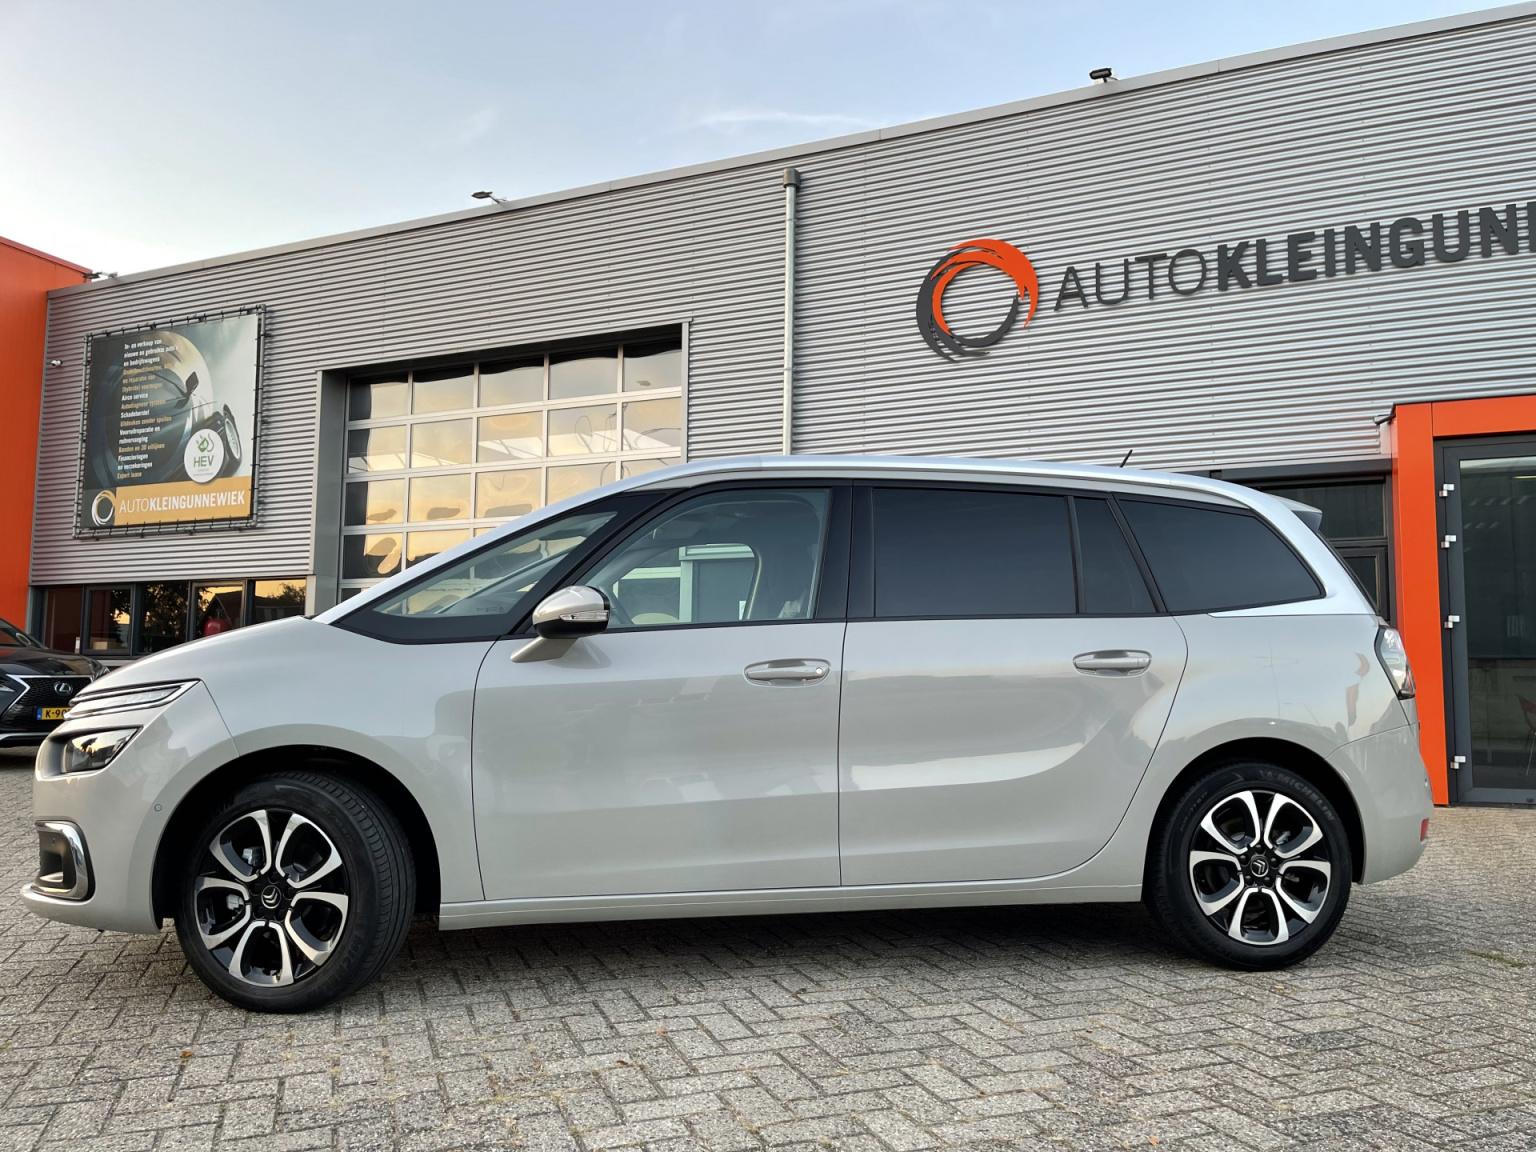 Citroën-Grand C4 Spacetourer-2